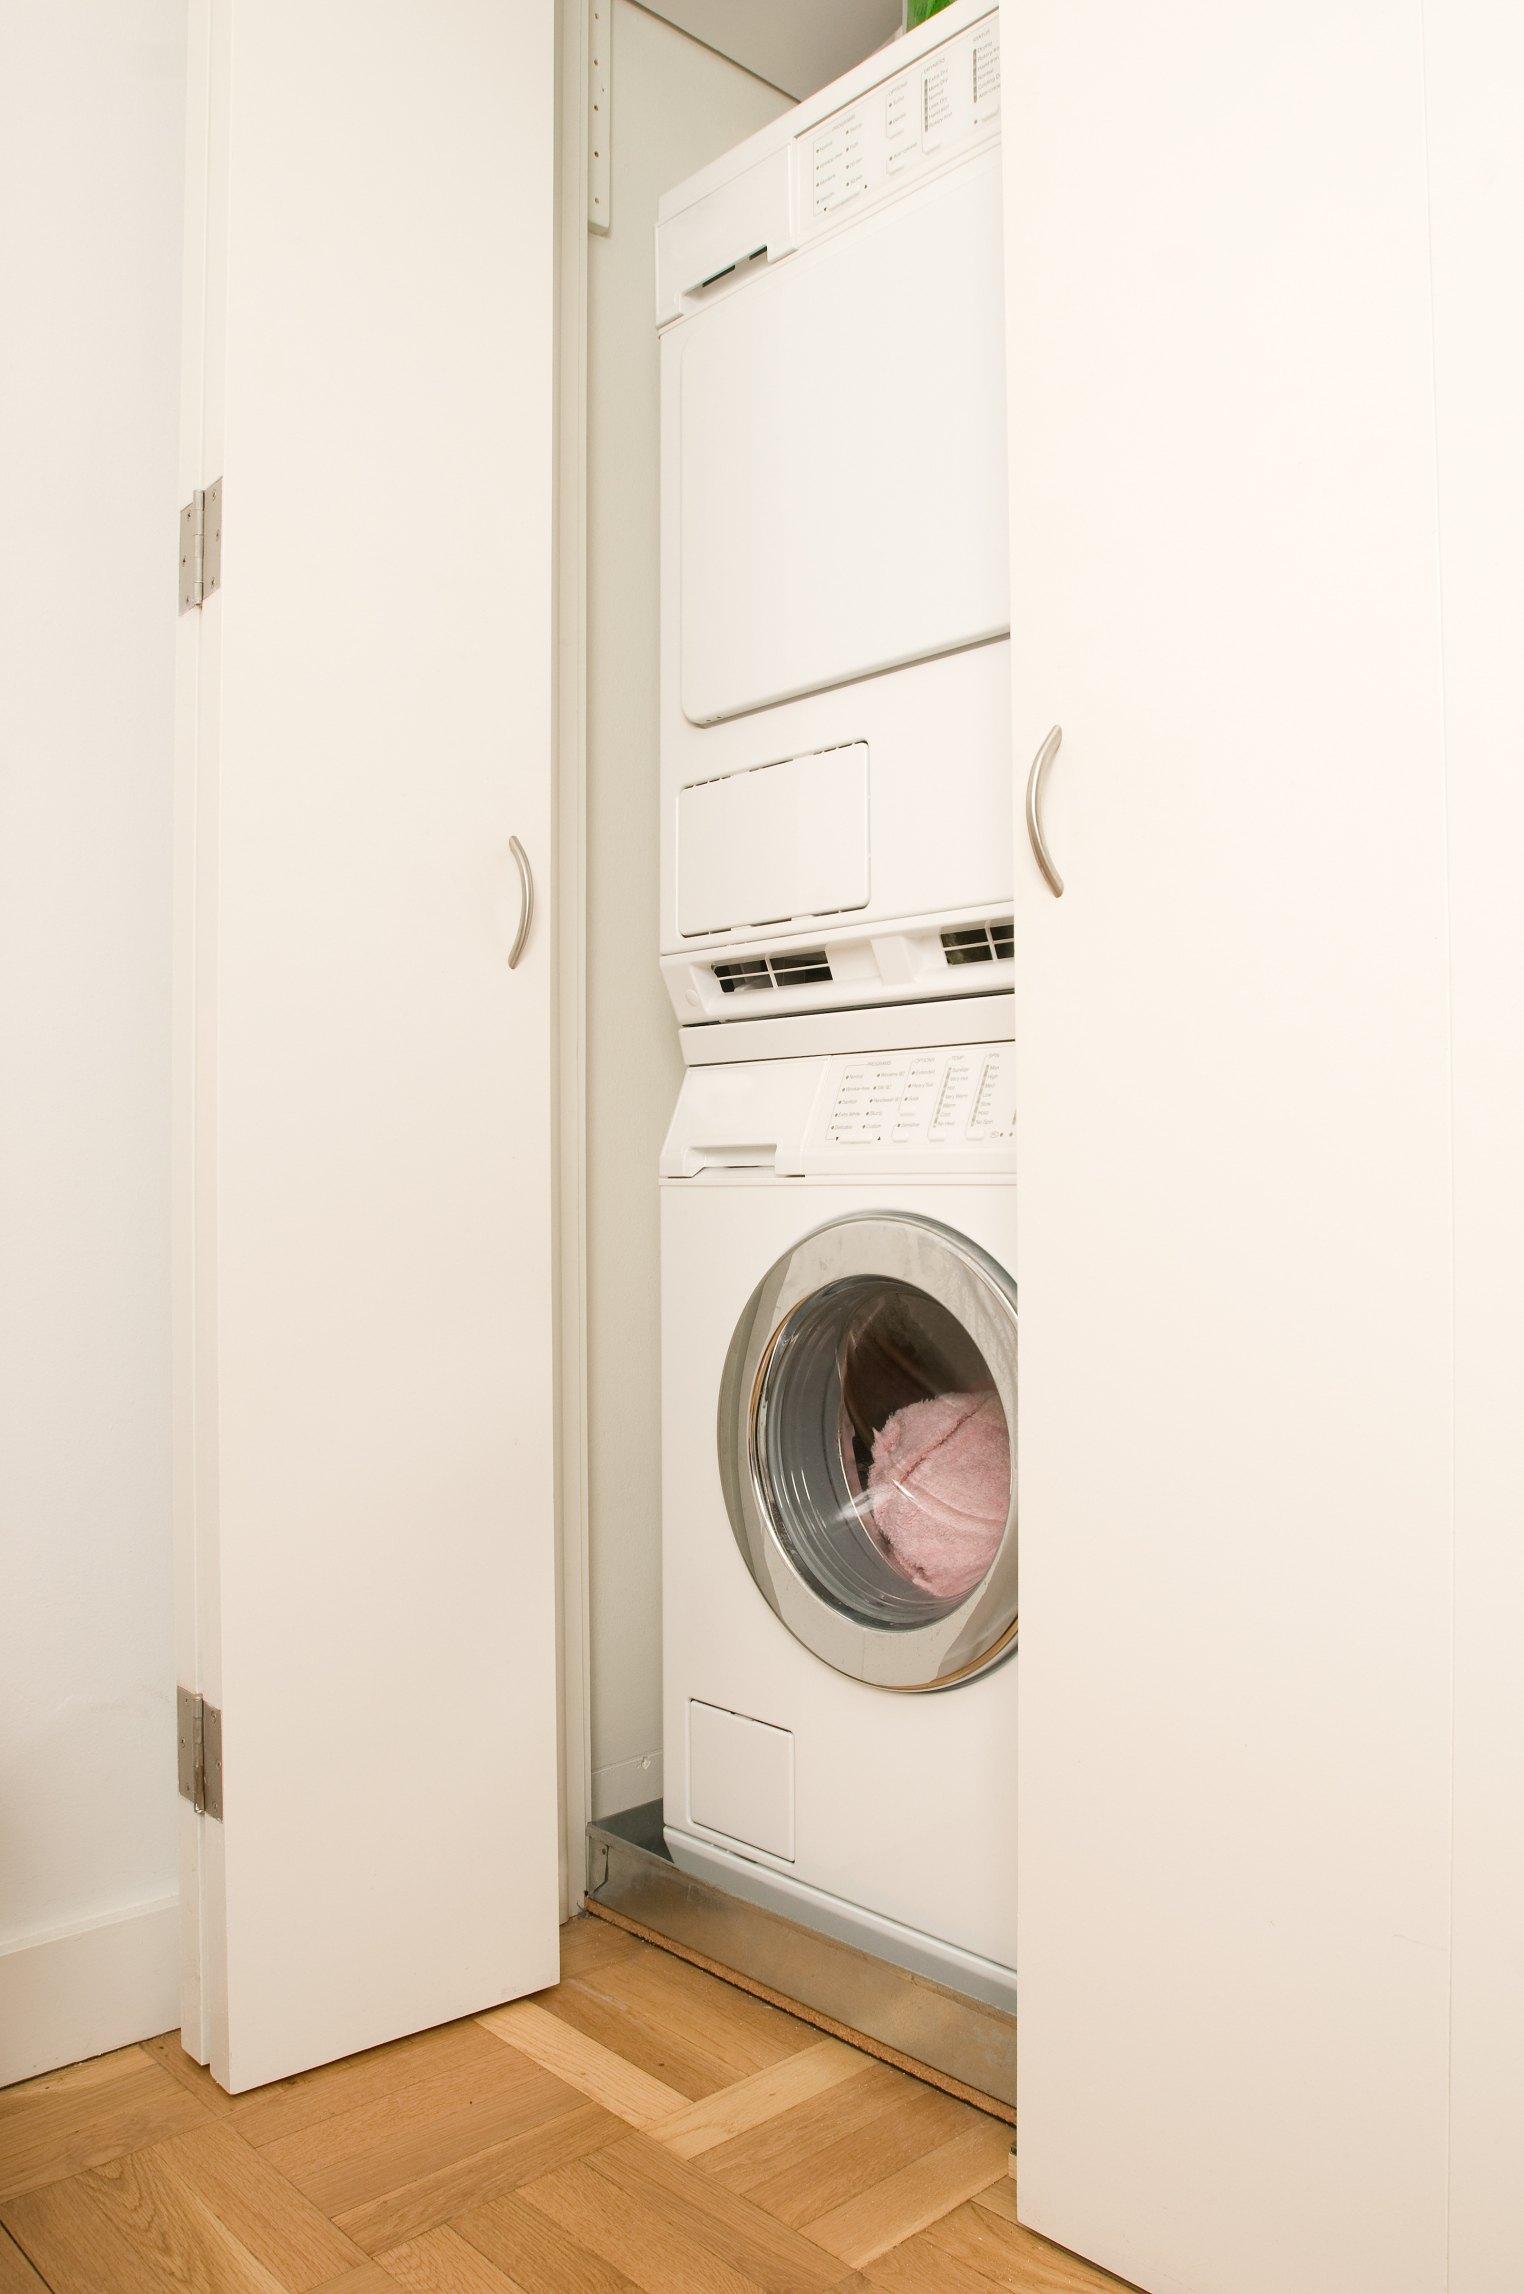 How To Build A Closet Around A Washing Machine Amp Dryer Ehow